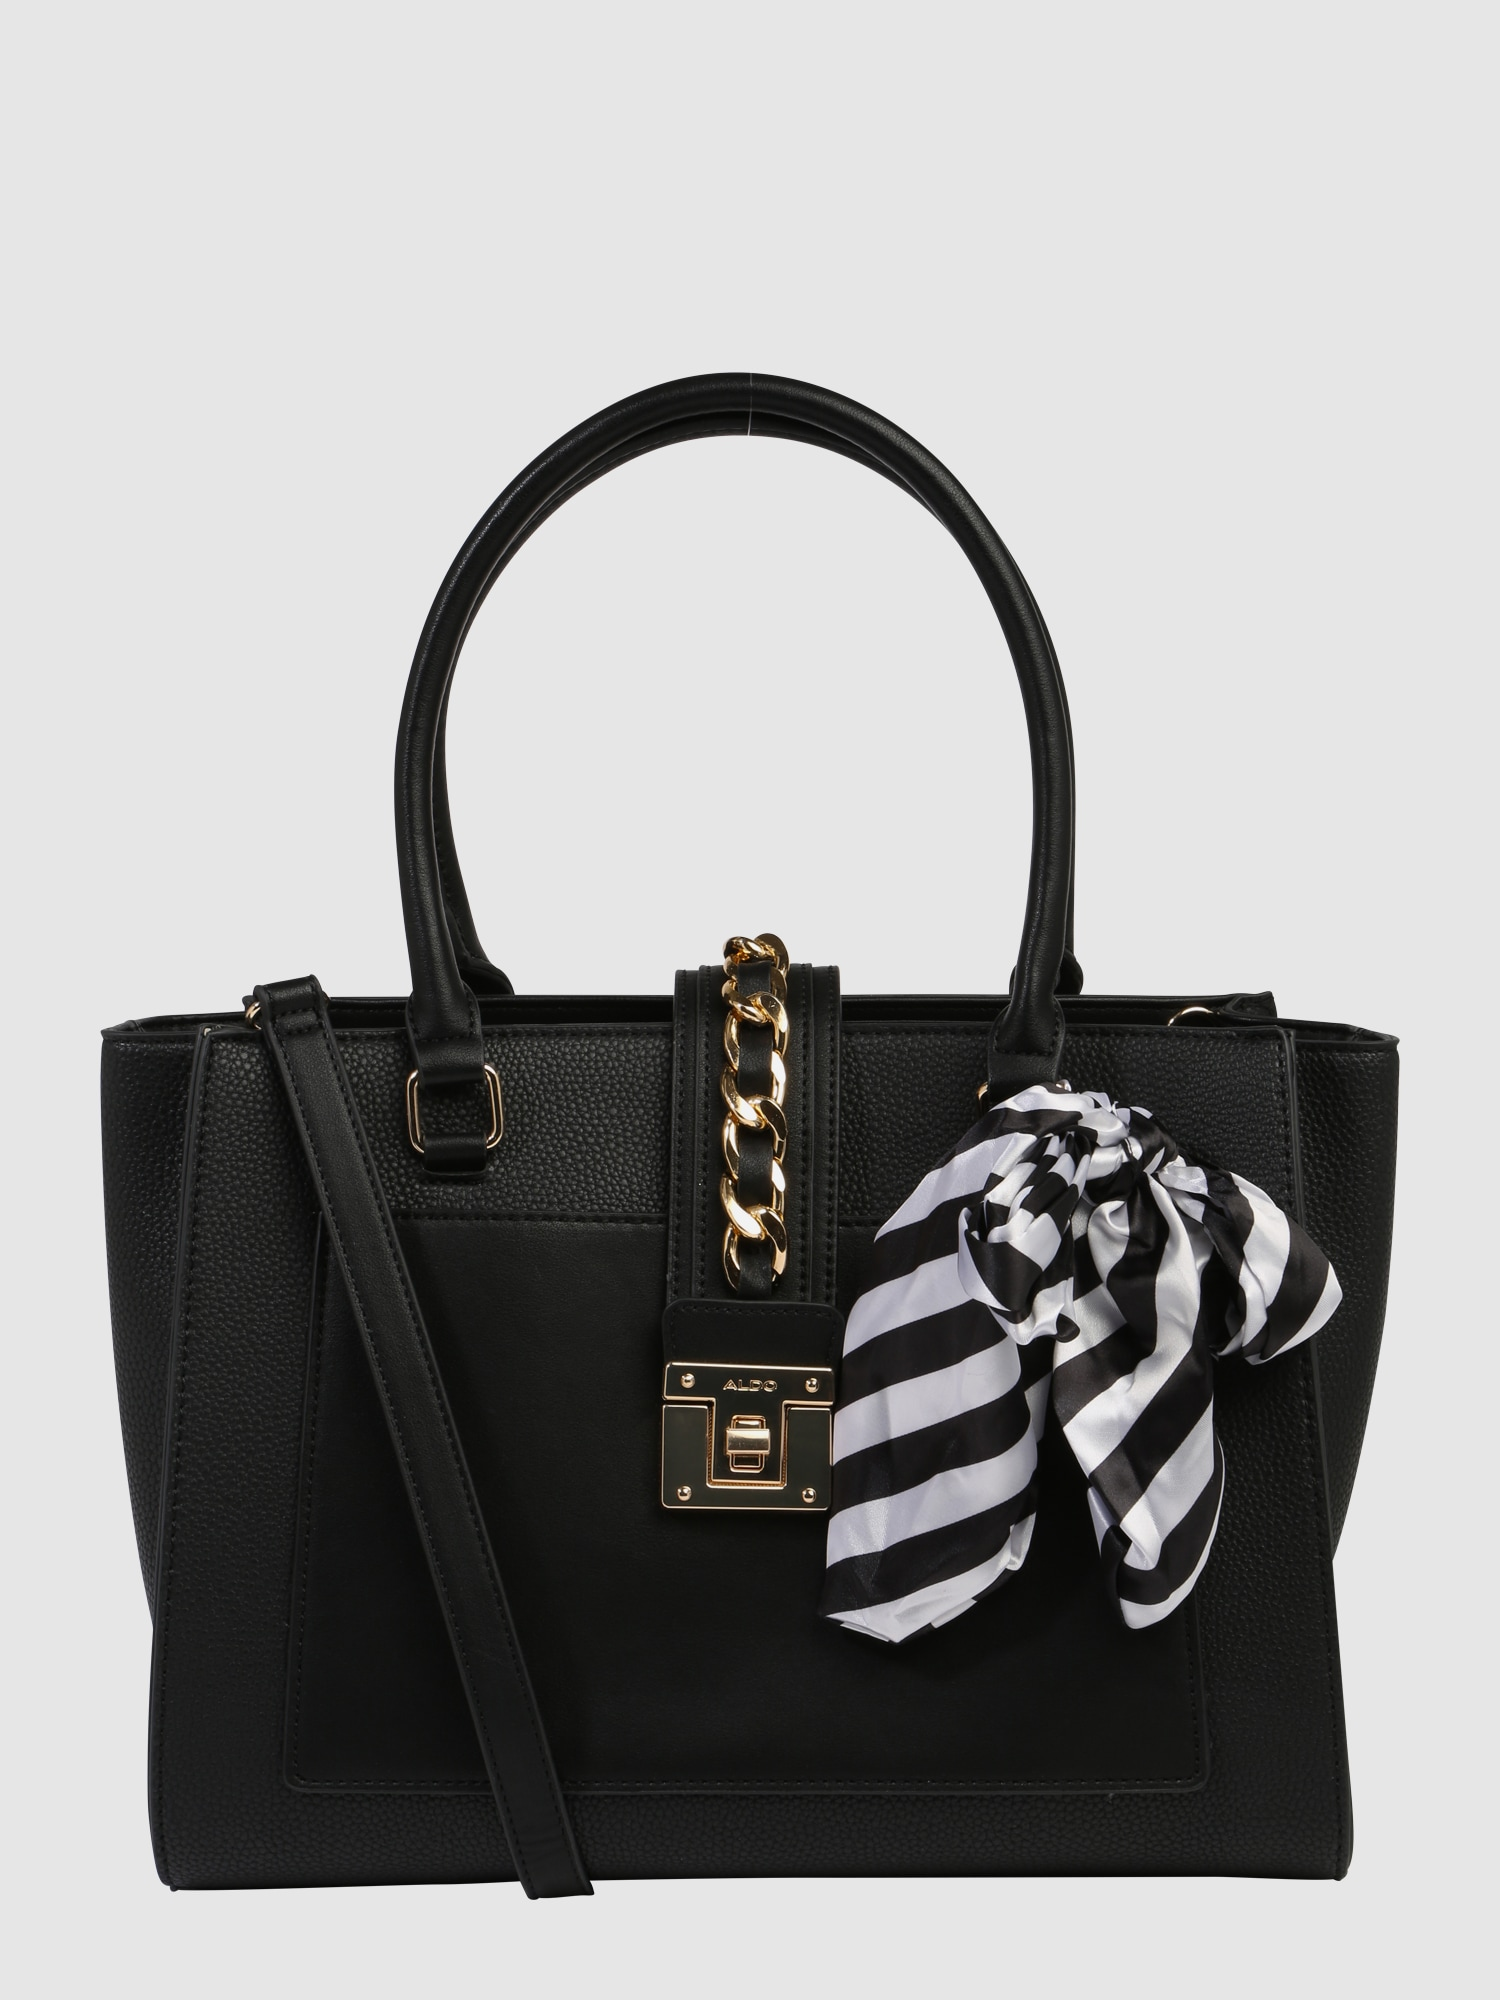 aldo handtasche 39 duvernay 39 in schwarz about you. Black Bedroom Furniture Sets. Home Design Ideas